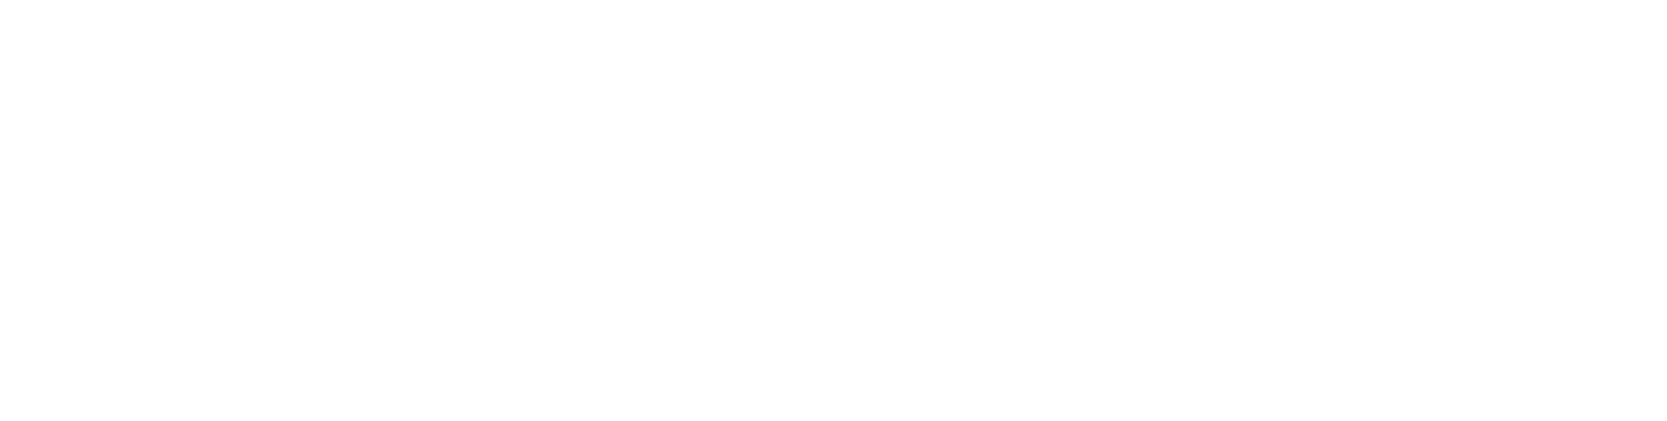 BraceID logo